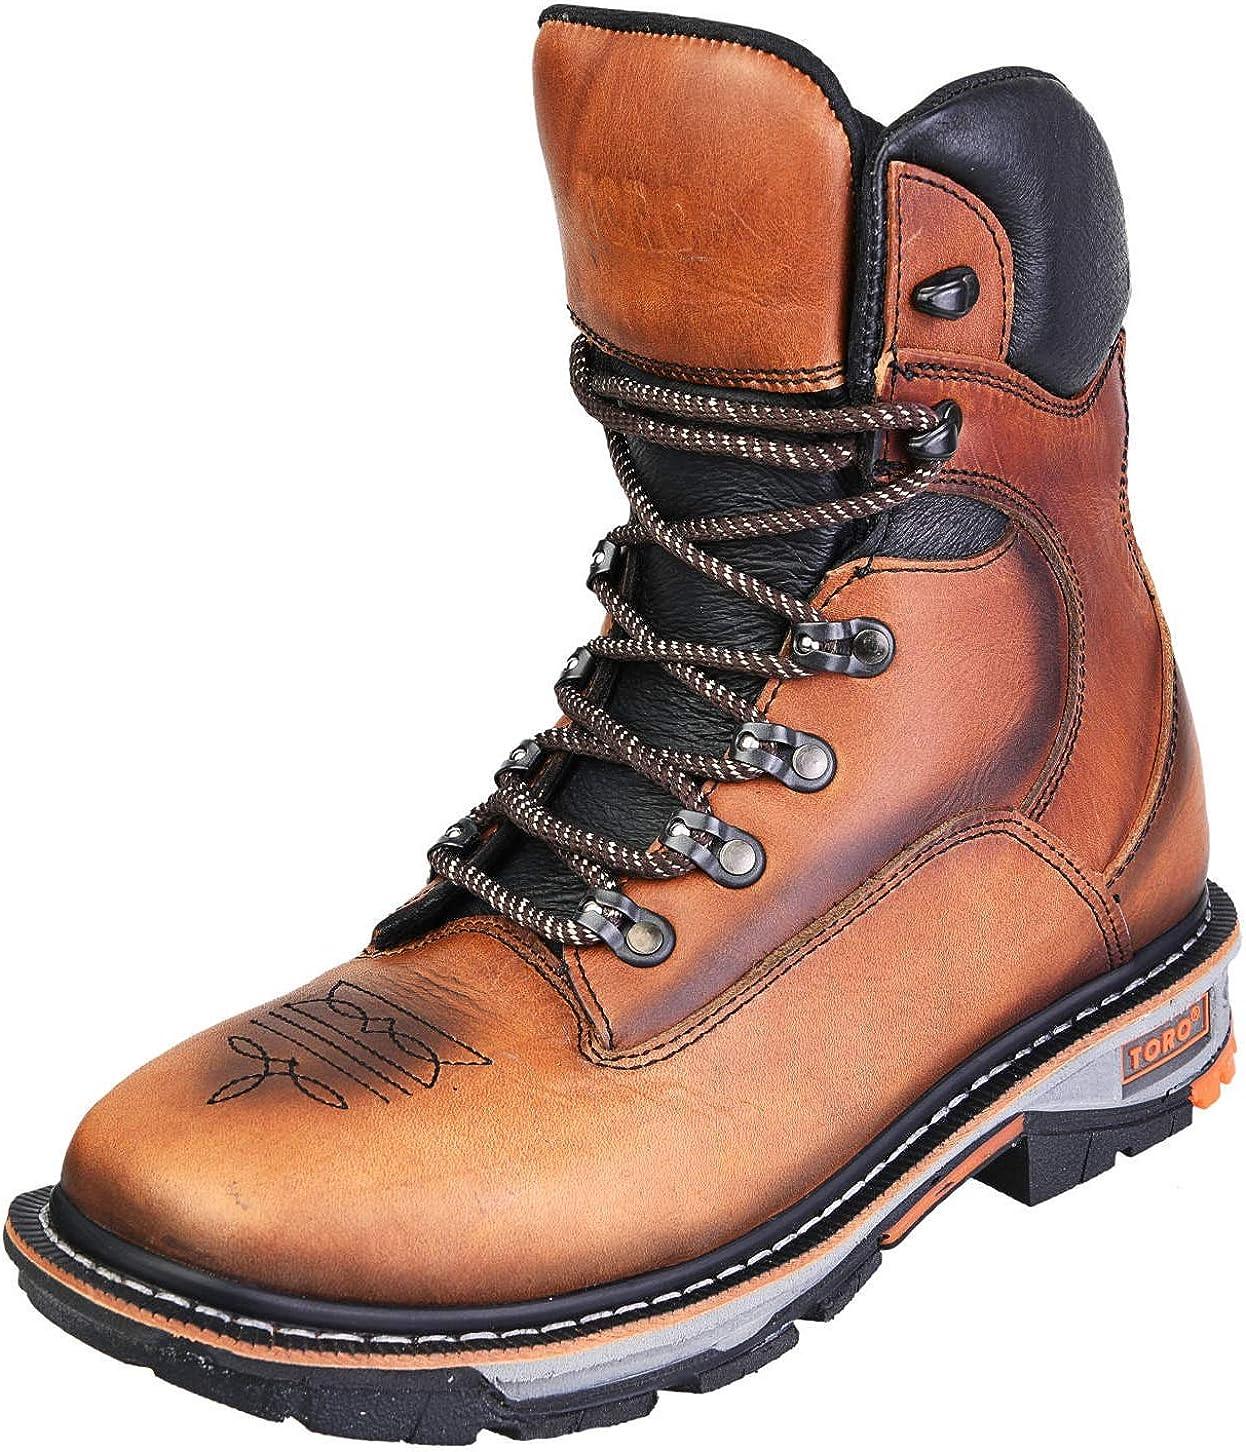 TORO BRAVO Men's Steel Toe Work Boots